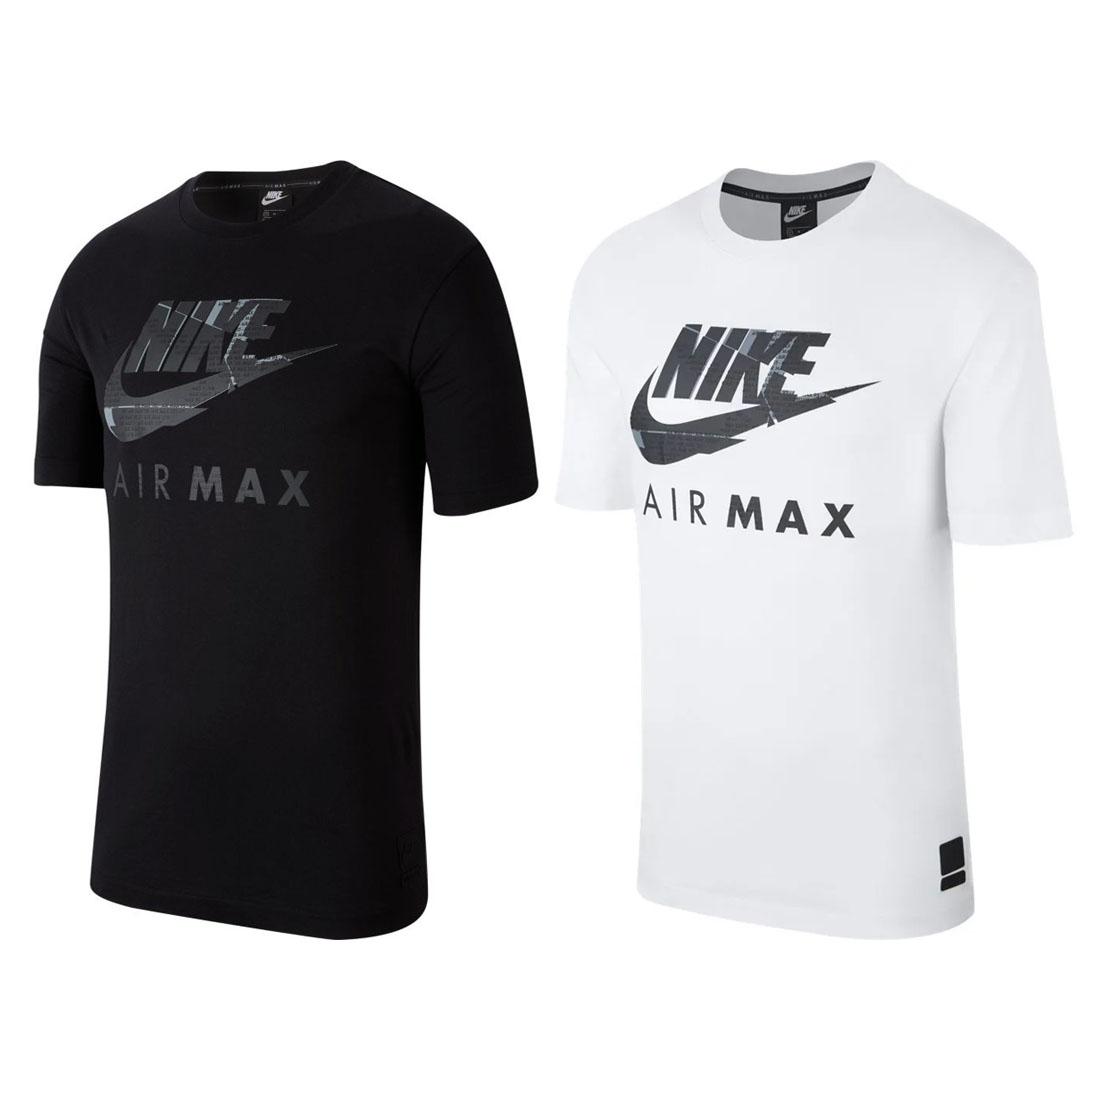 Nike Air Max NSW Mens Black White